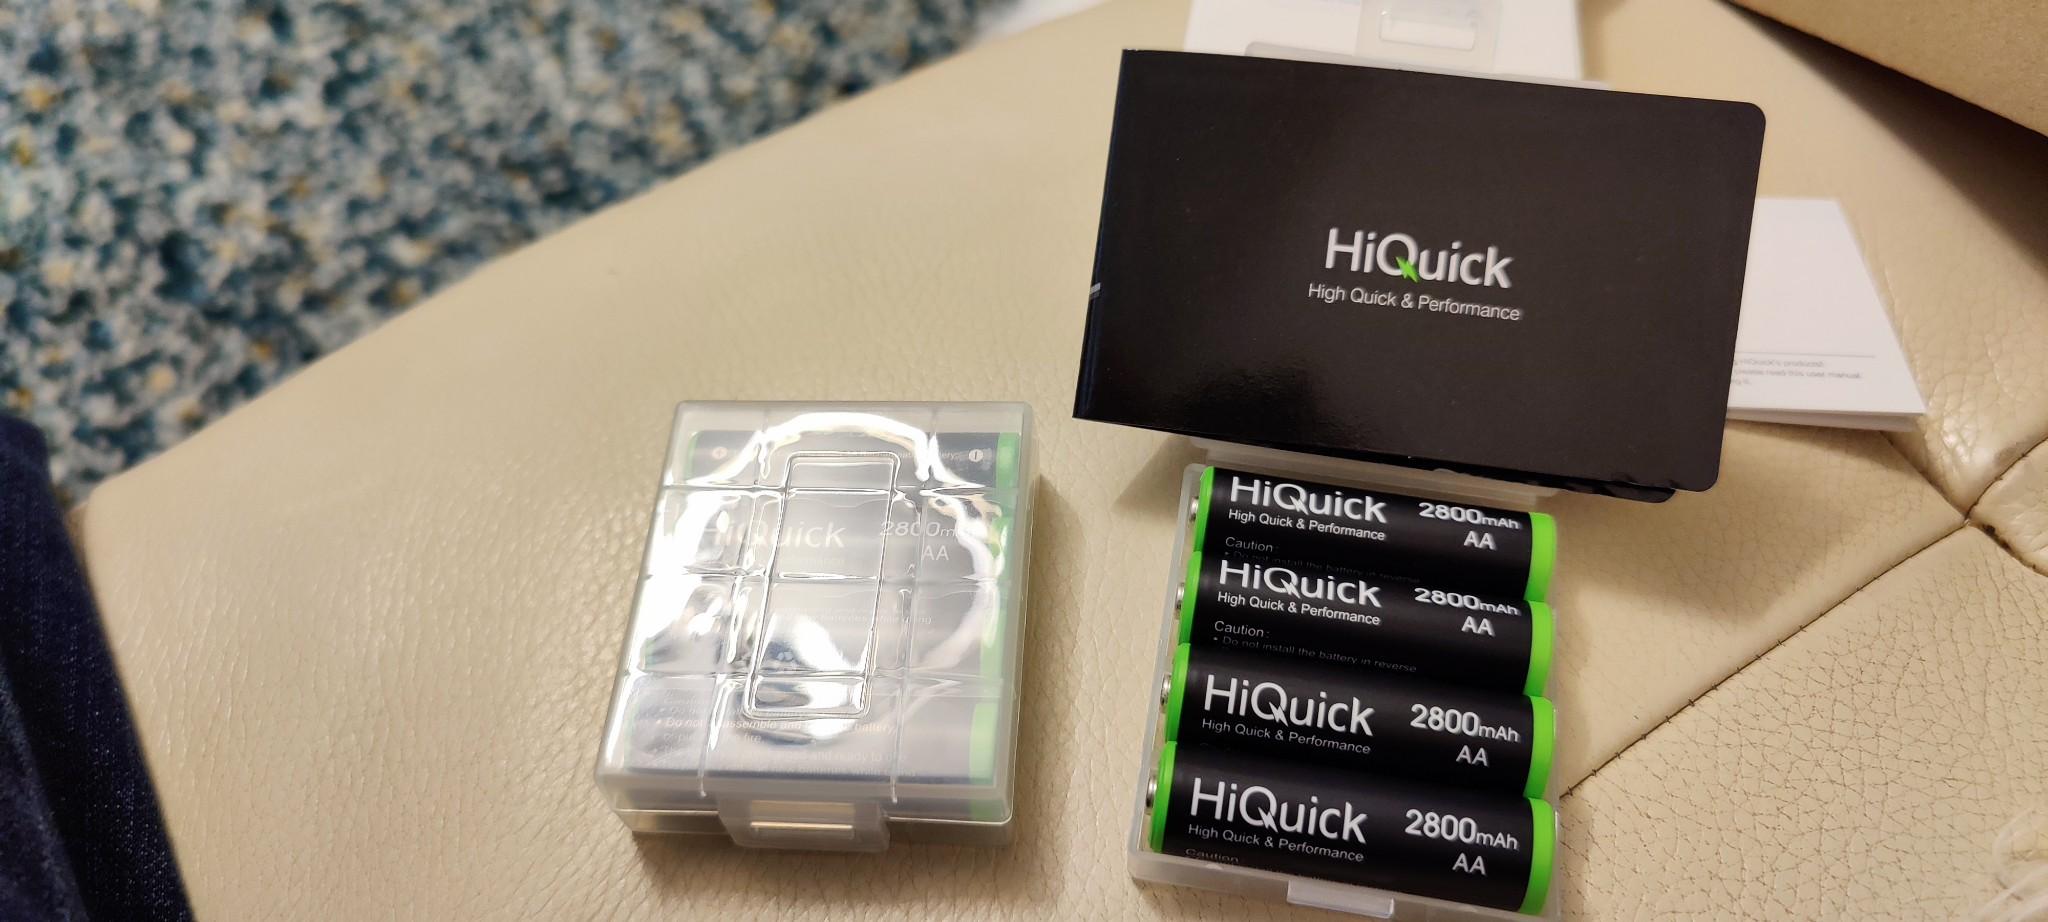 HiQuick 8 x AA Batteries, Rechargeable 2800mAh